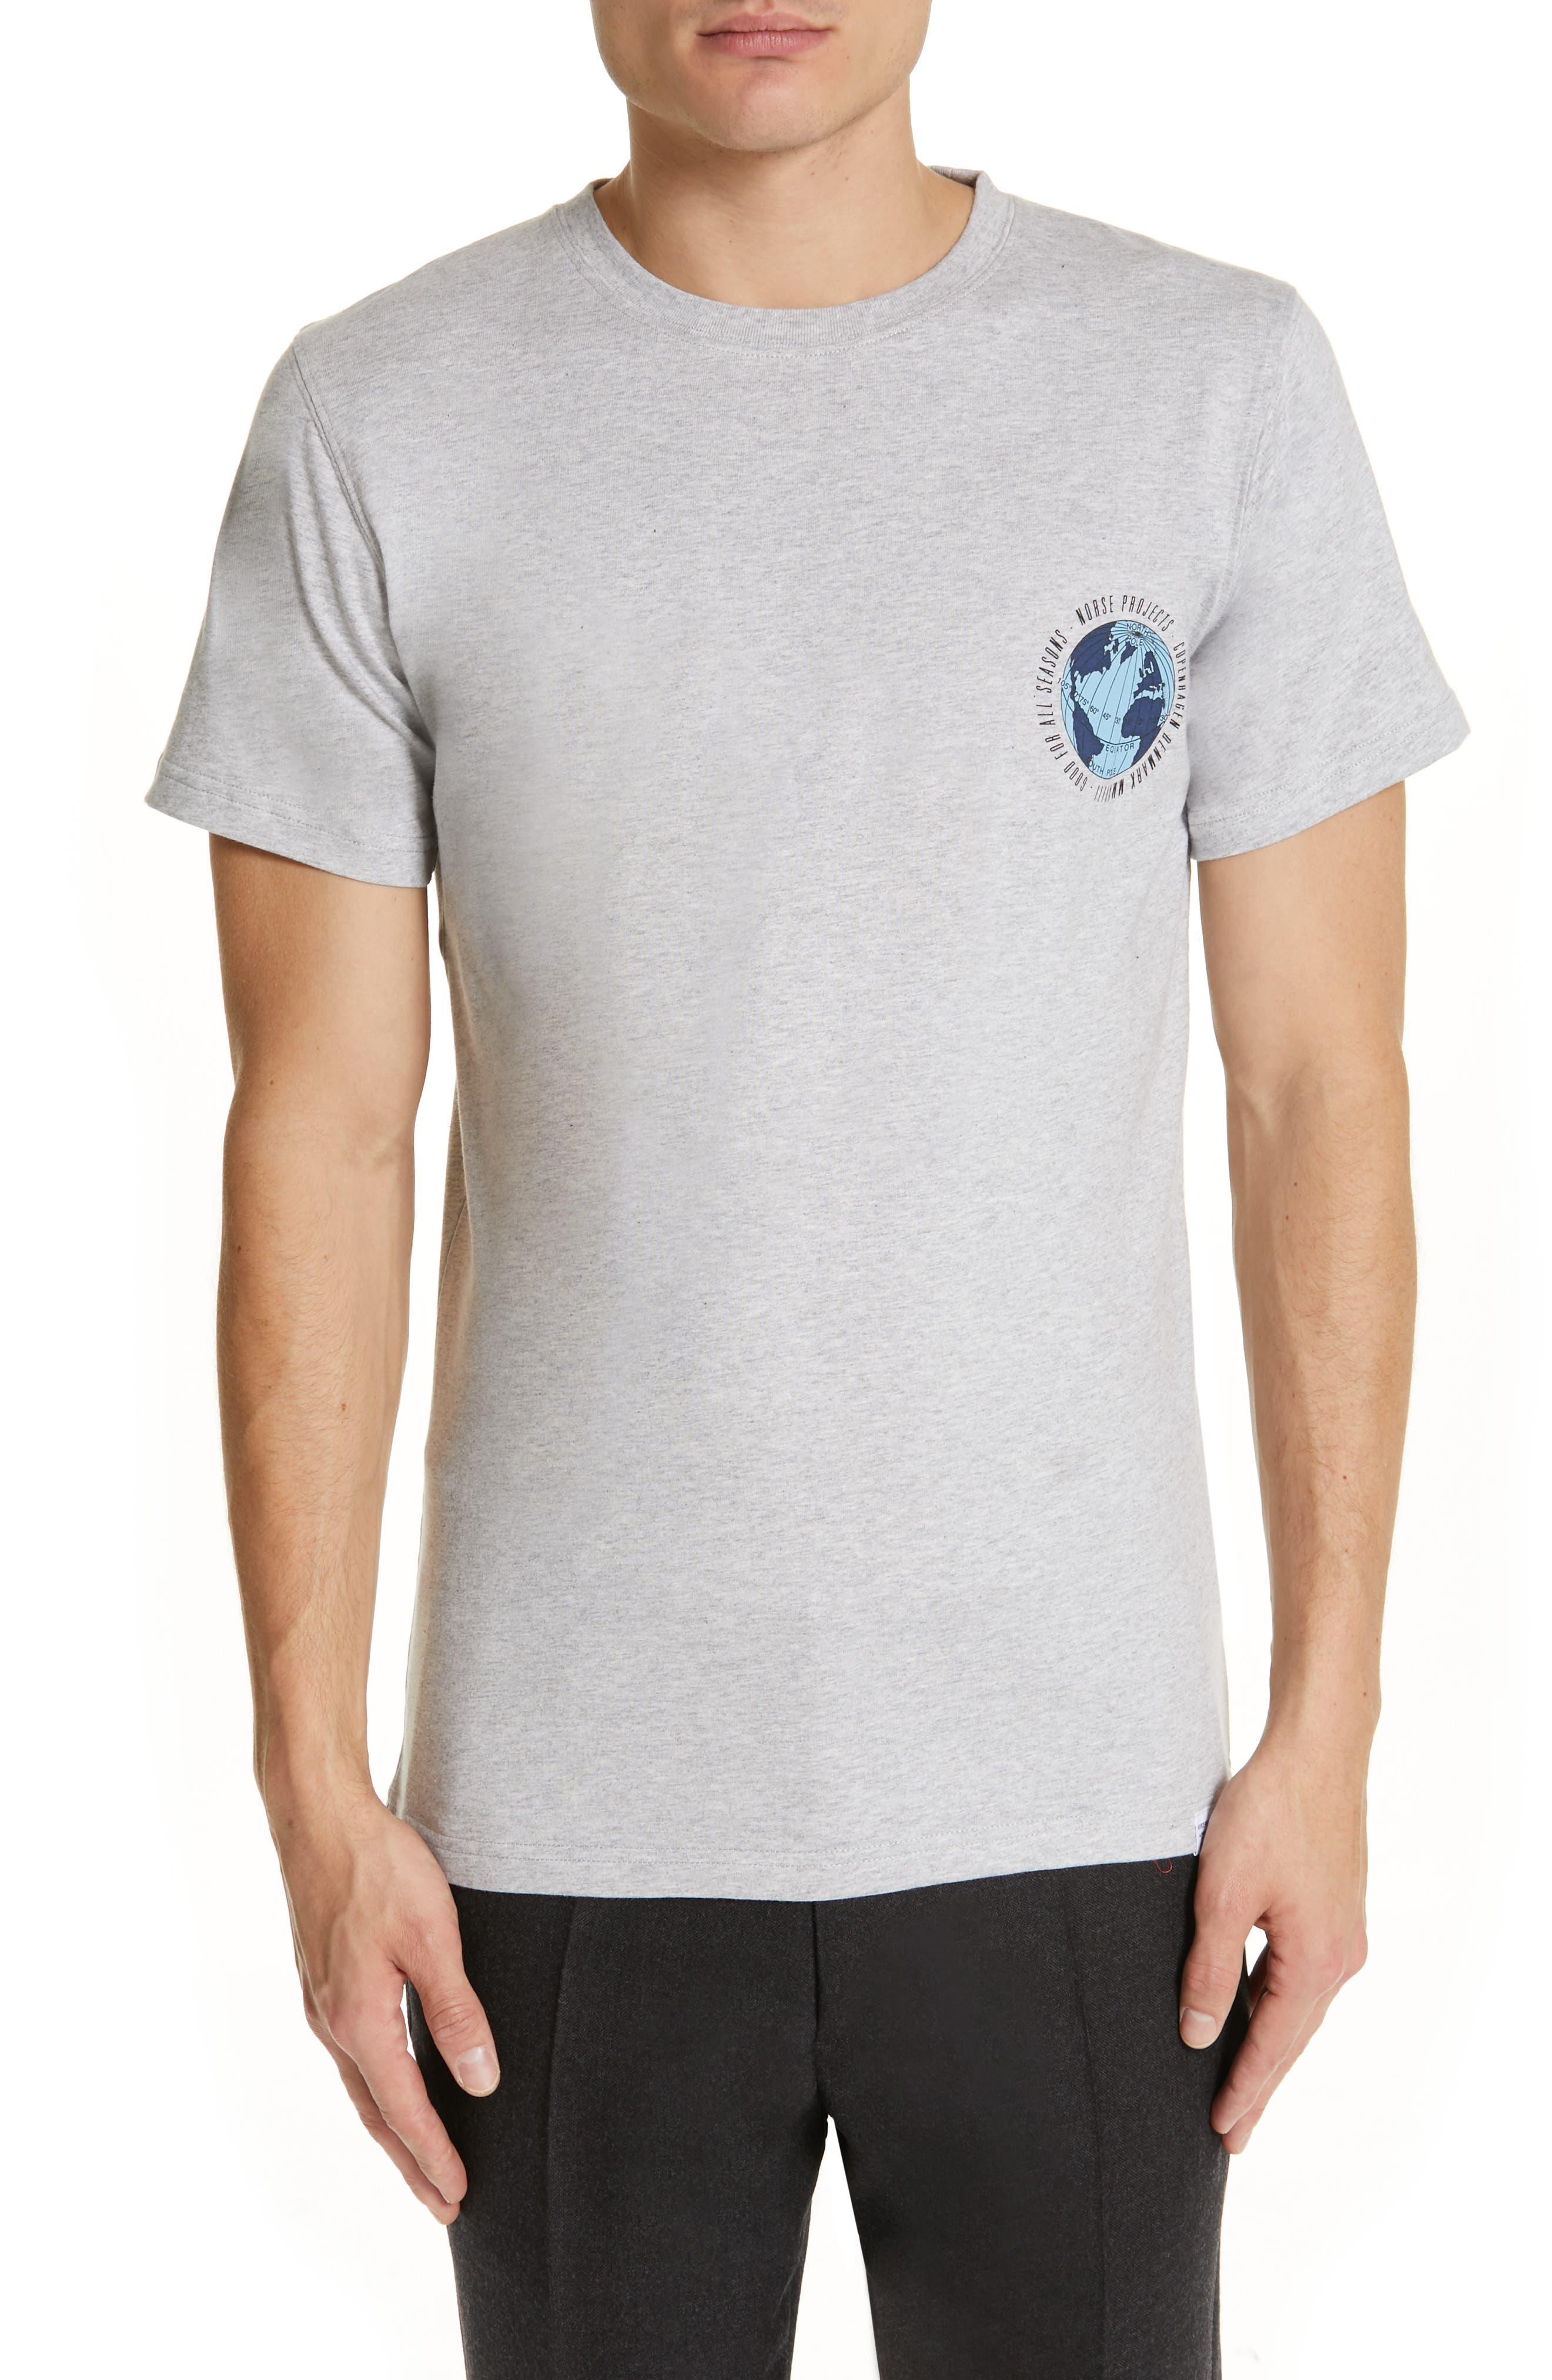 NORSE PROJECTS Niels Globe Logo T-Shirt in Light Grey Melange